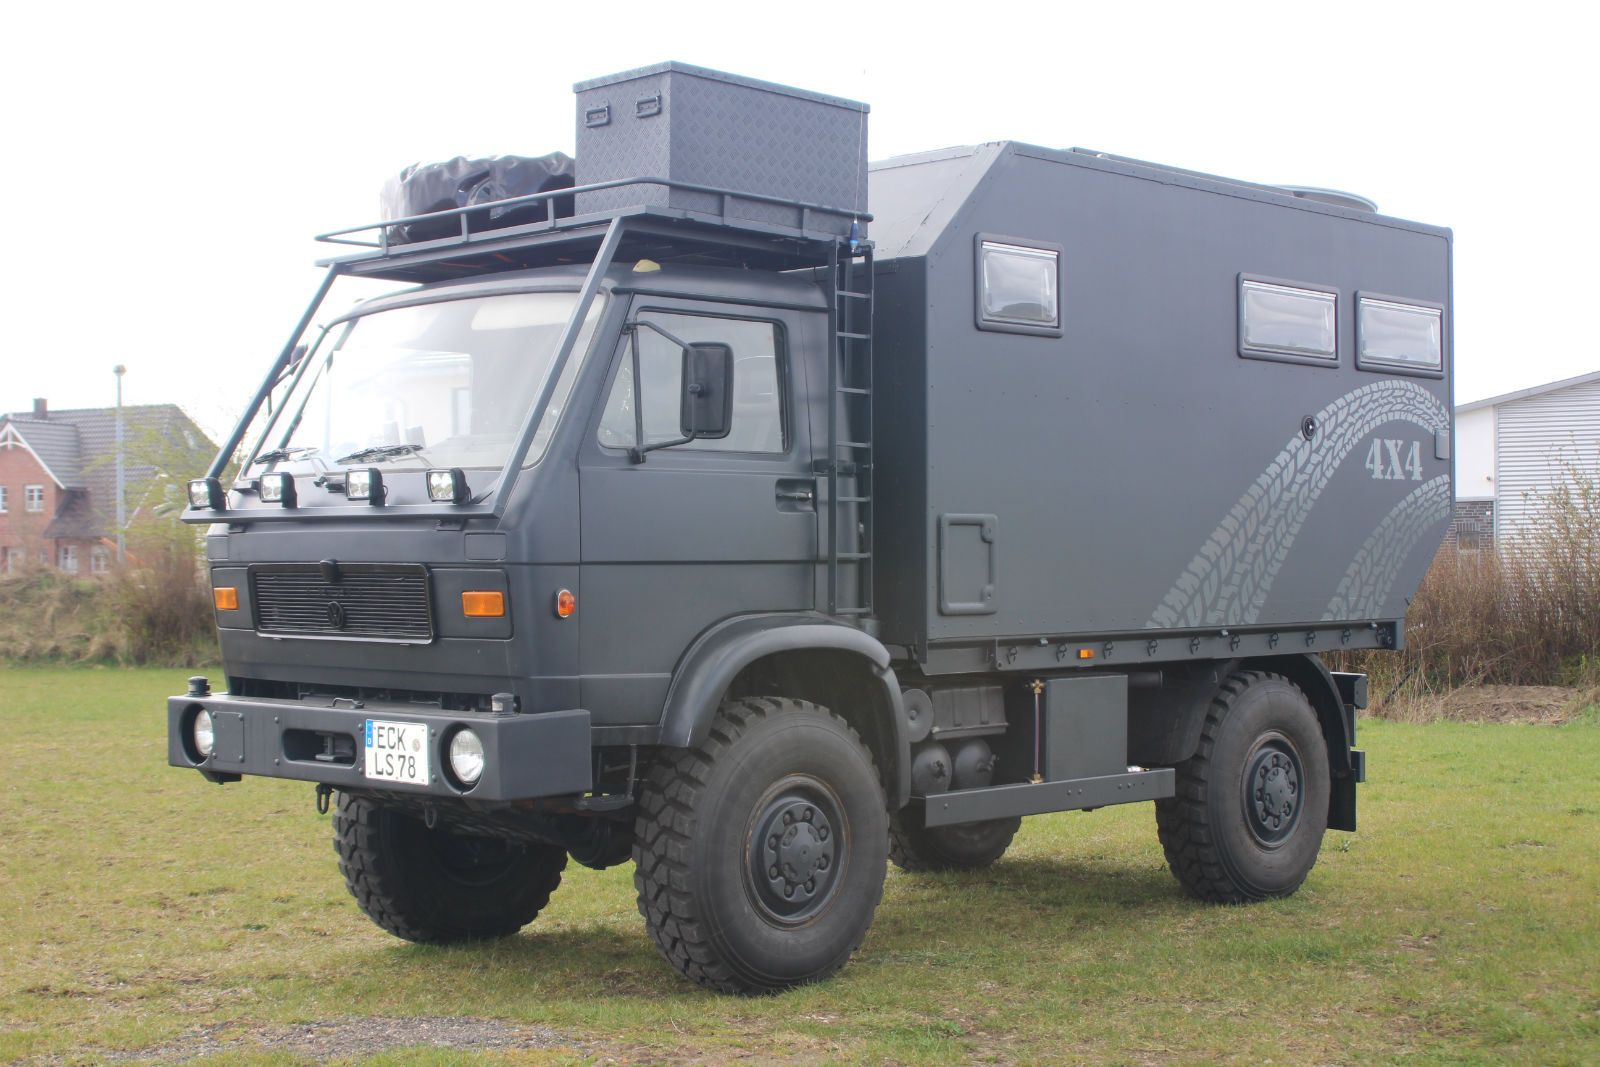 MAN 8.8 FAE 8x8 (Neubau Koffer) als Wohnmobil andere in Owschlag